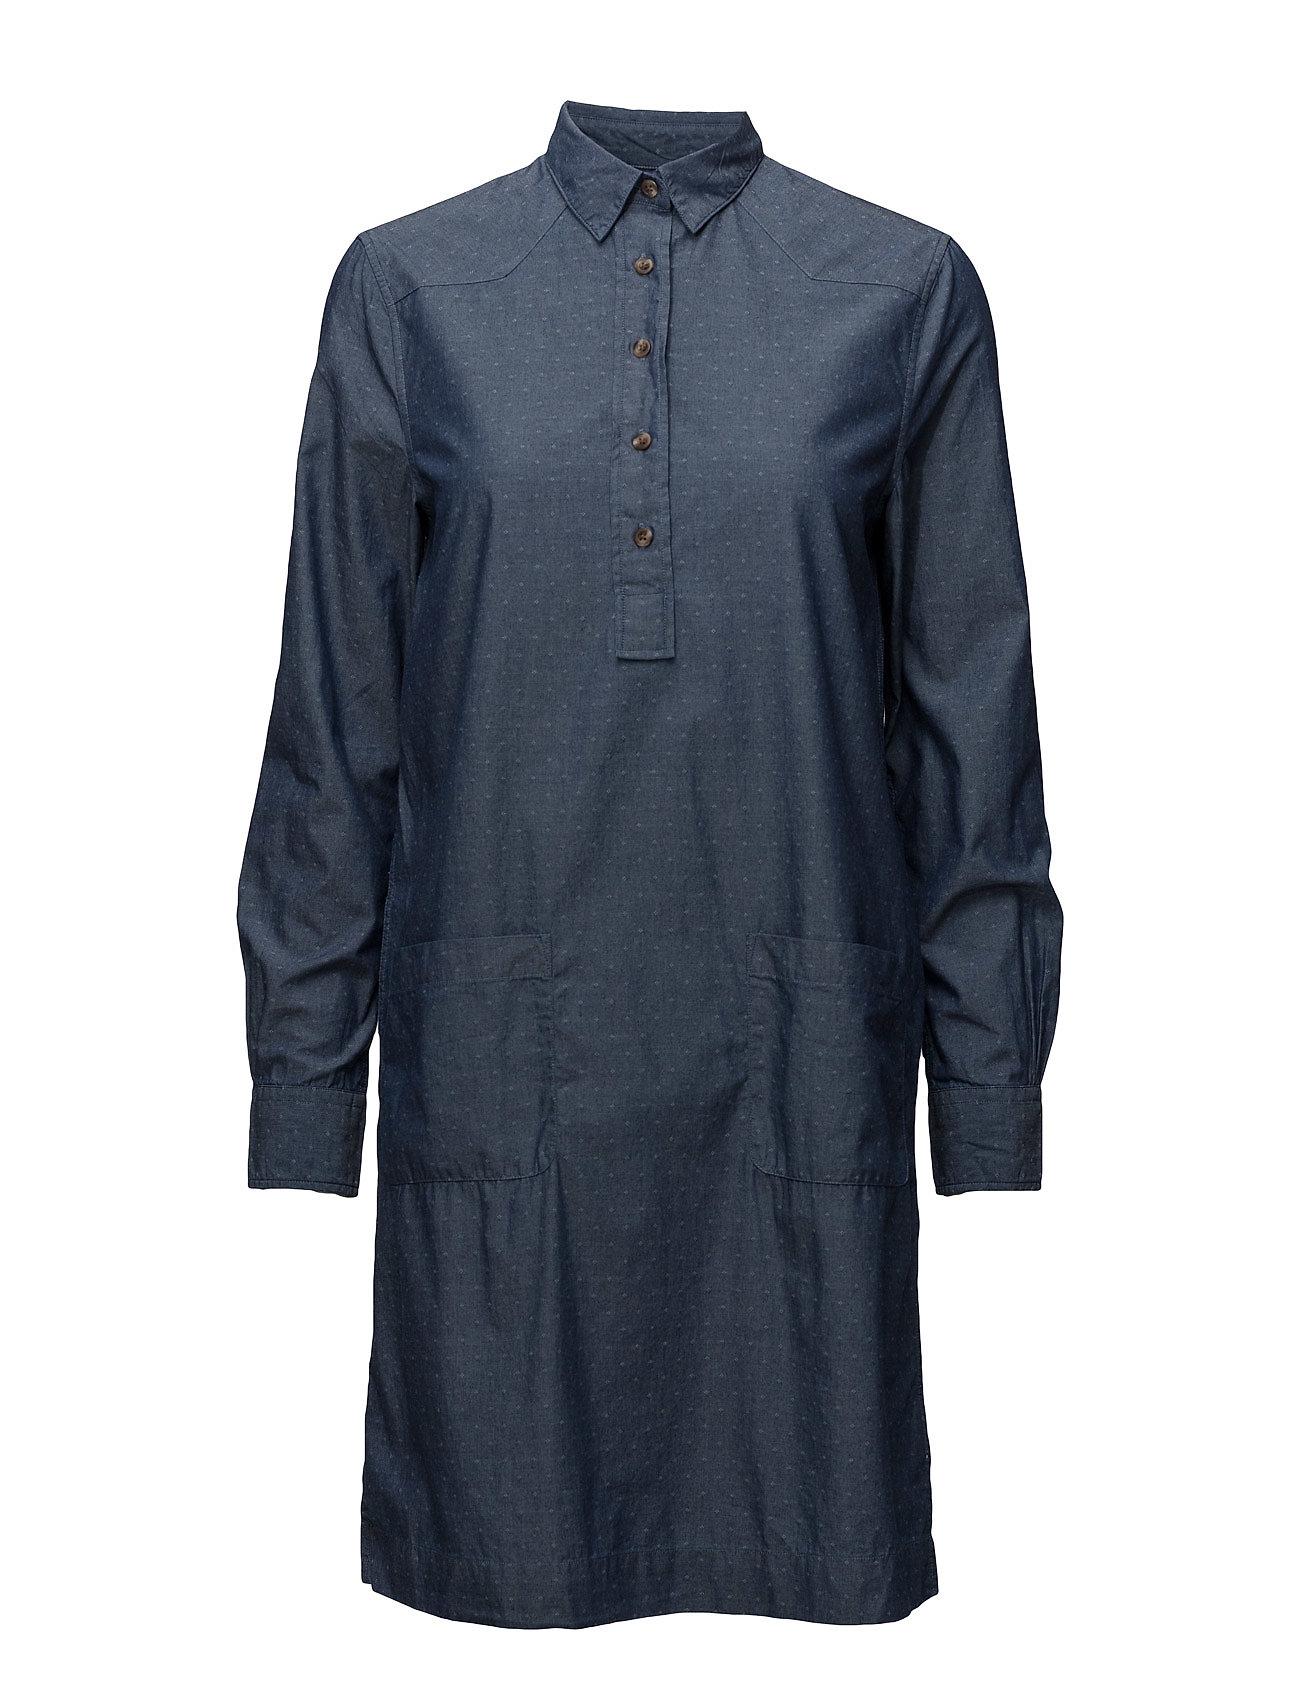 gant – O1. tp dobby chambray shirt dress på boozt.com dk